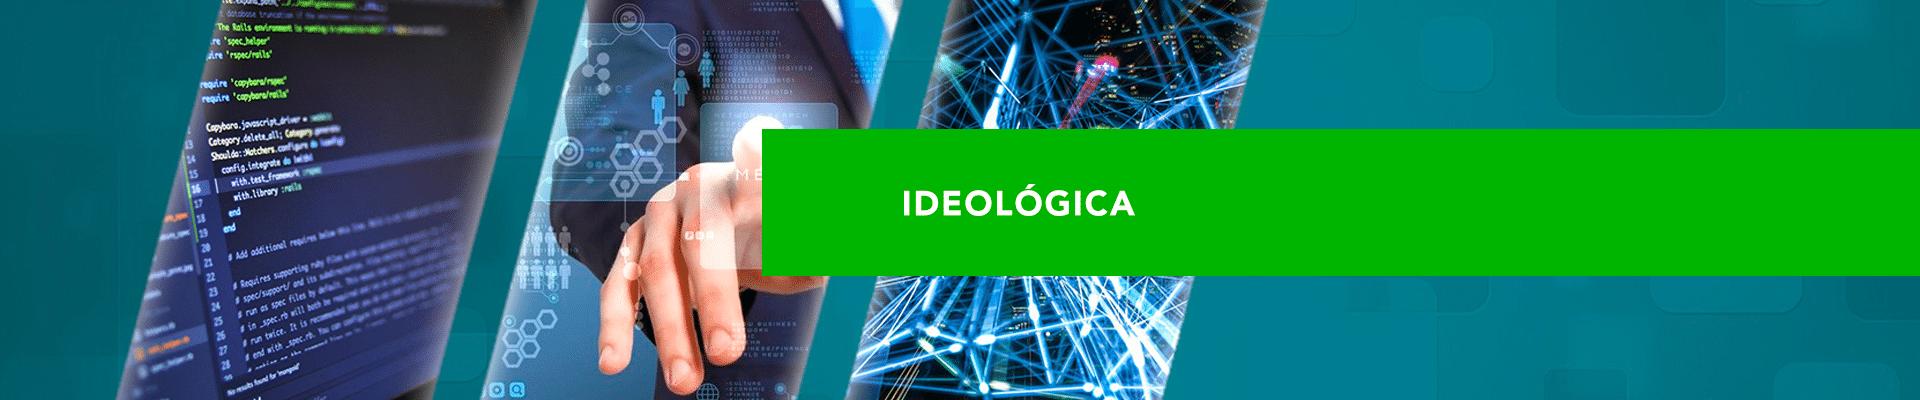 ideologica-banner-´principal